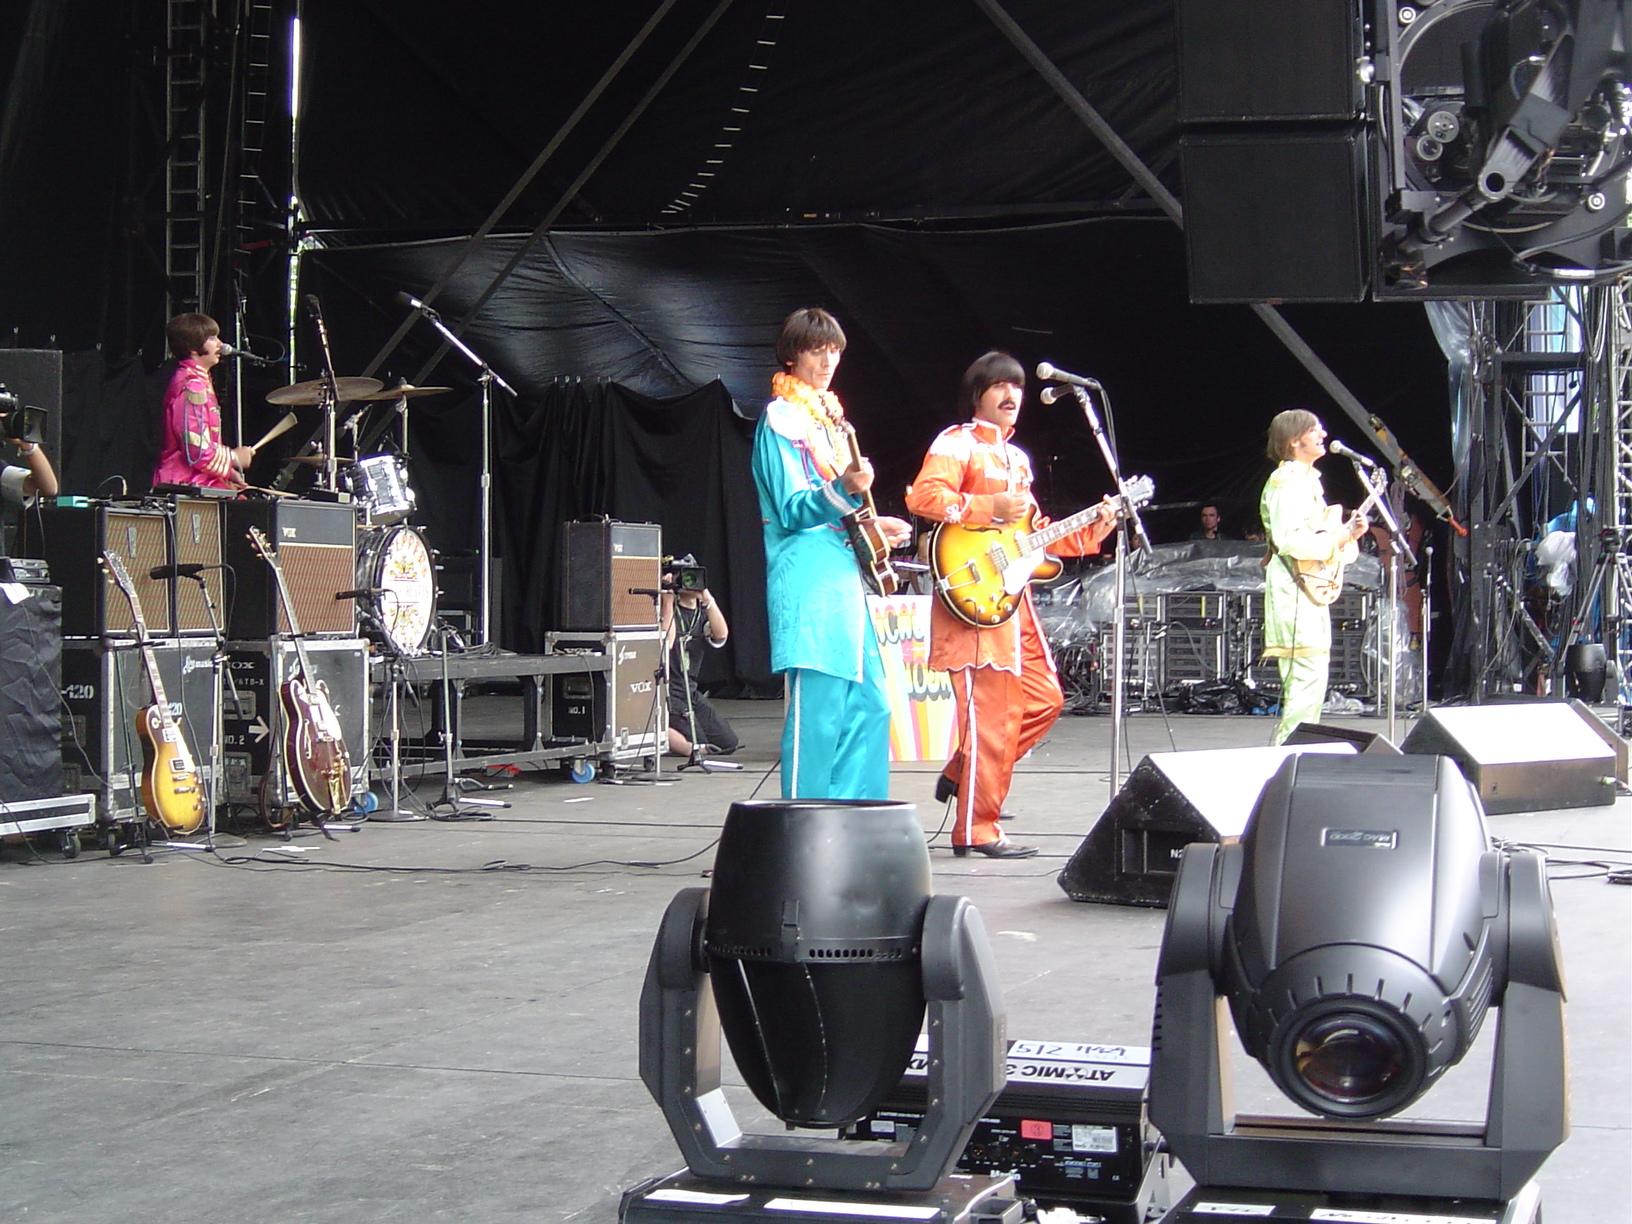 FUJI ROCK FESTIVAL'03 (via)